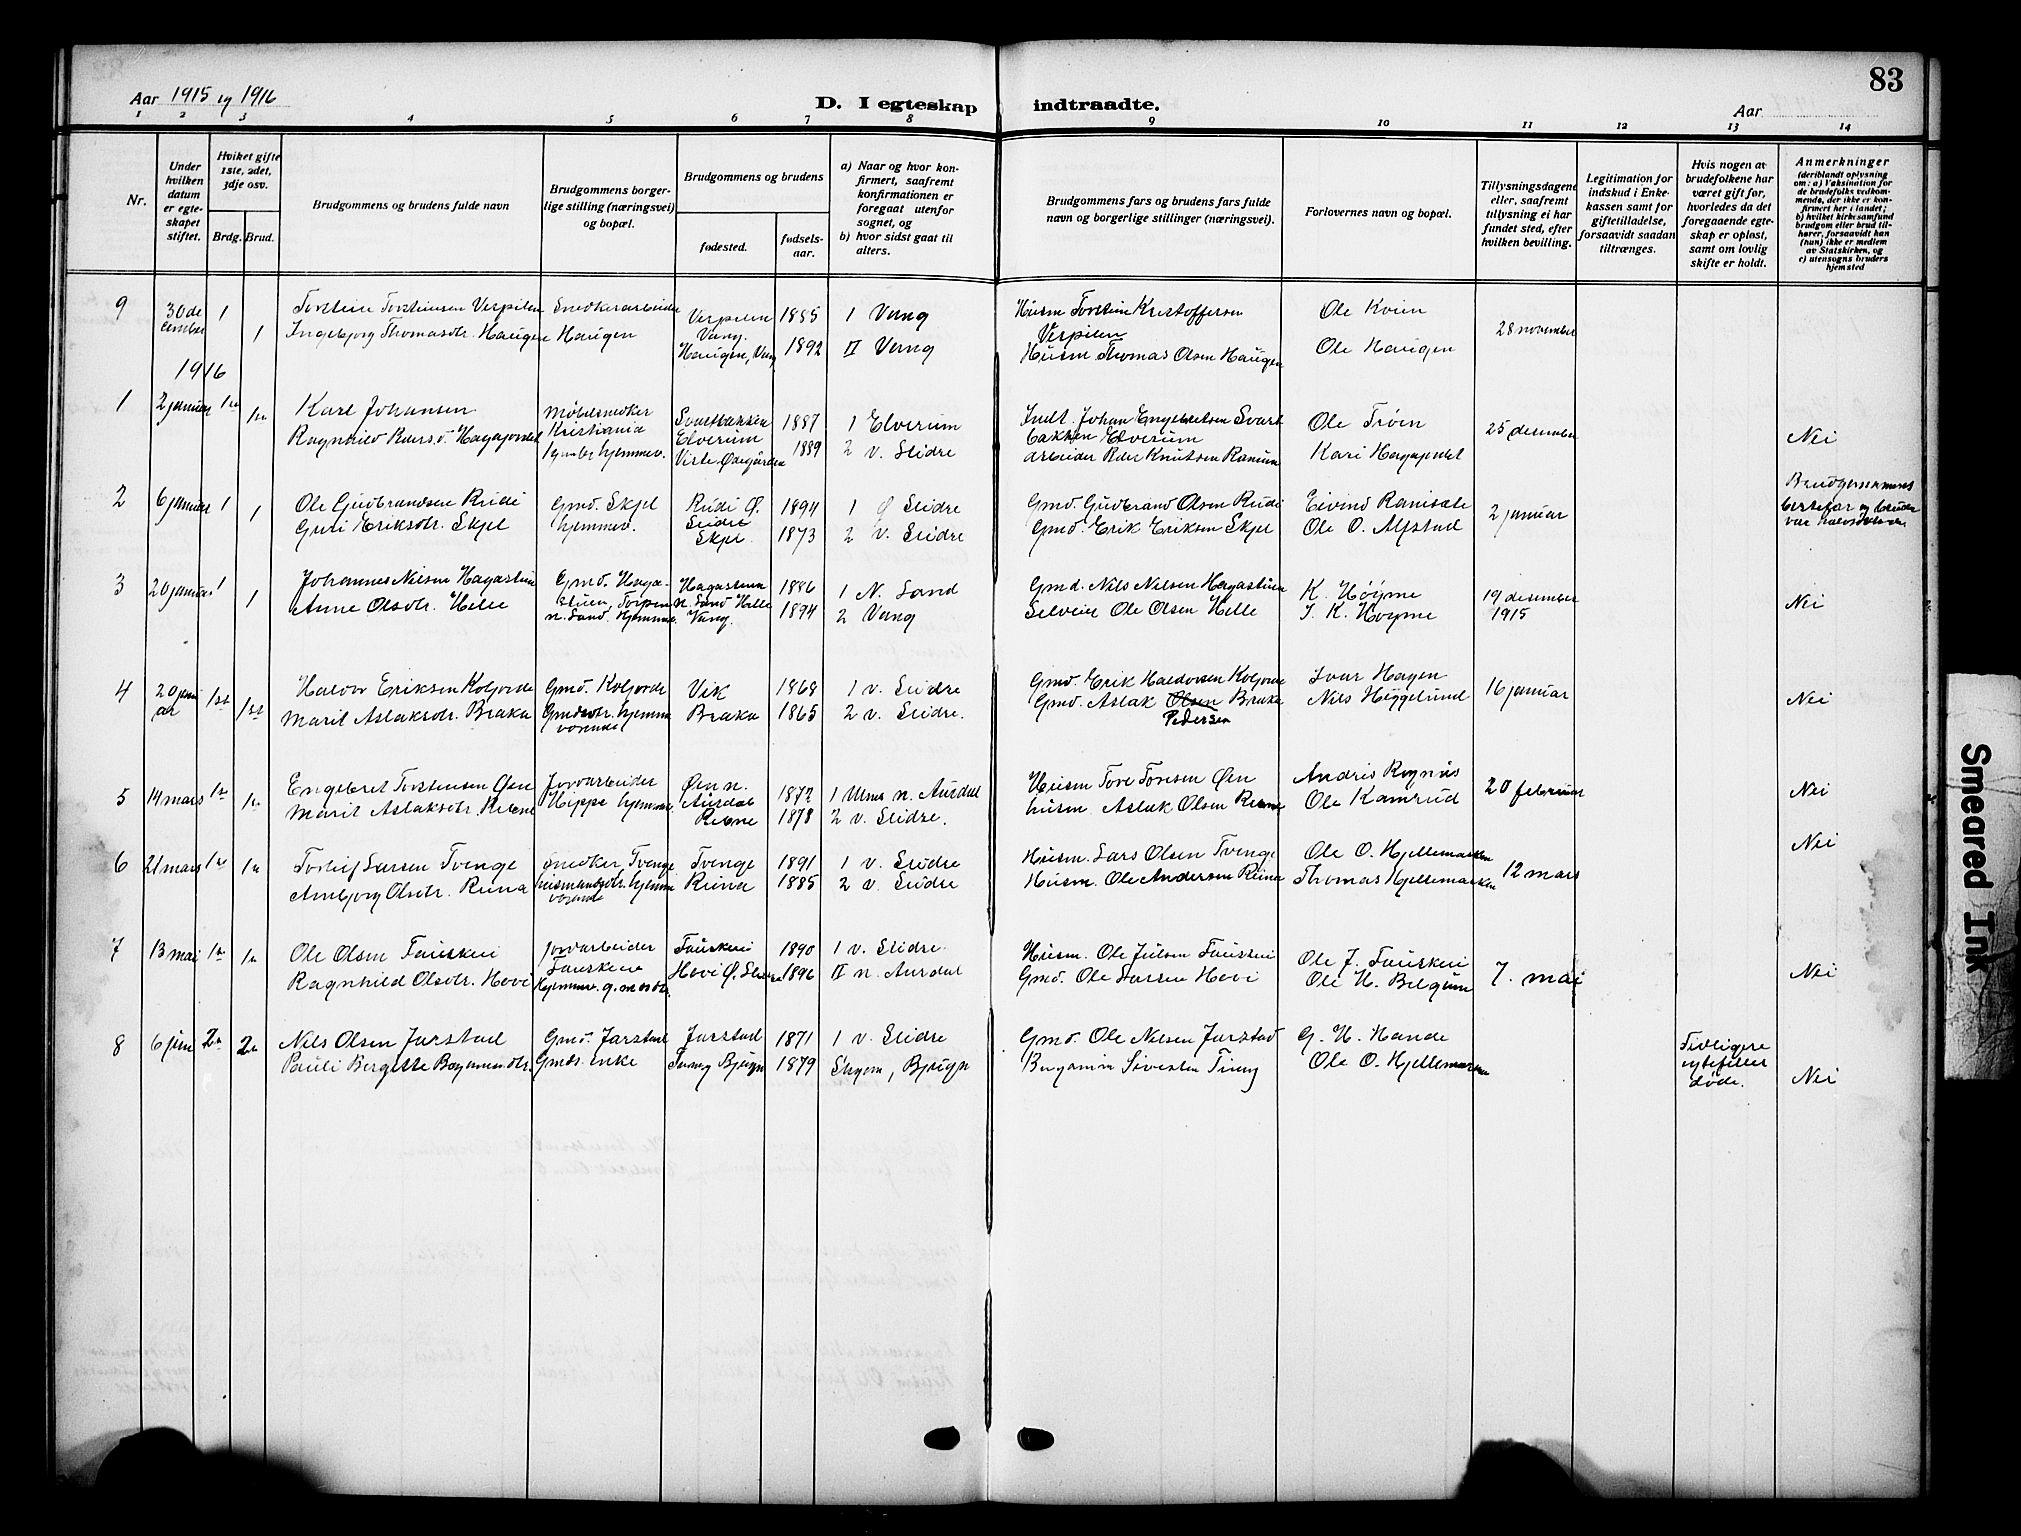 SAH, Vestre Slidre prestekontor, Klokkerbok nr. 7, 1909-1930, s. 83